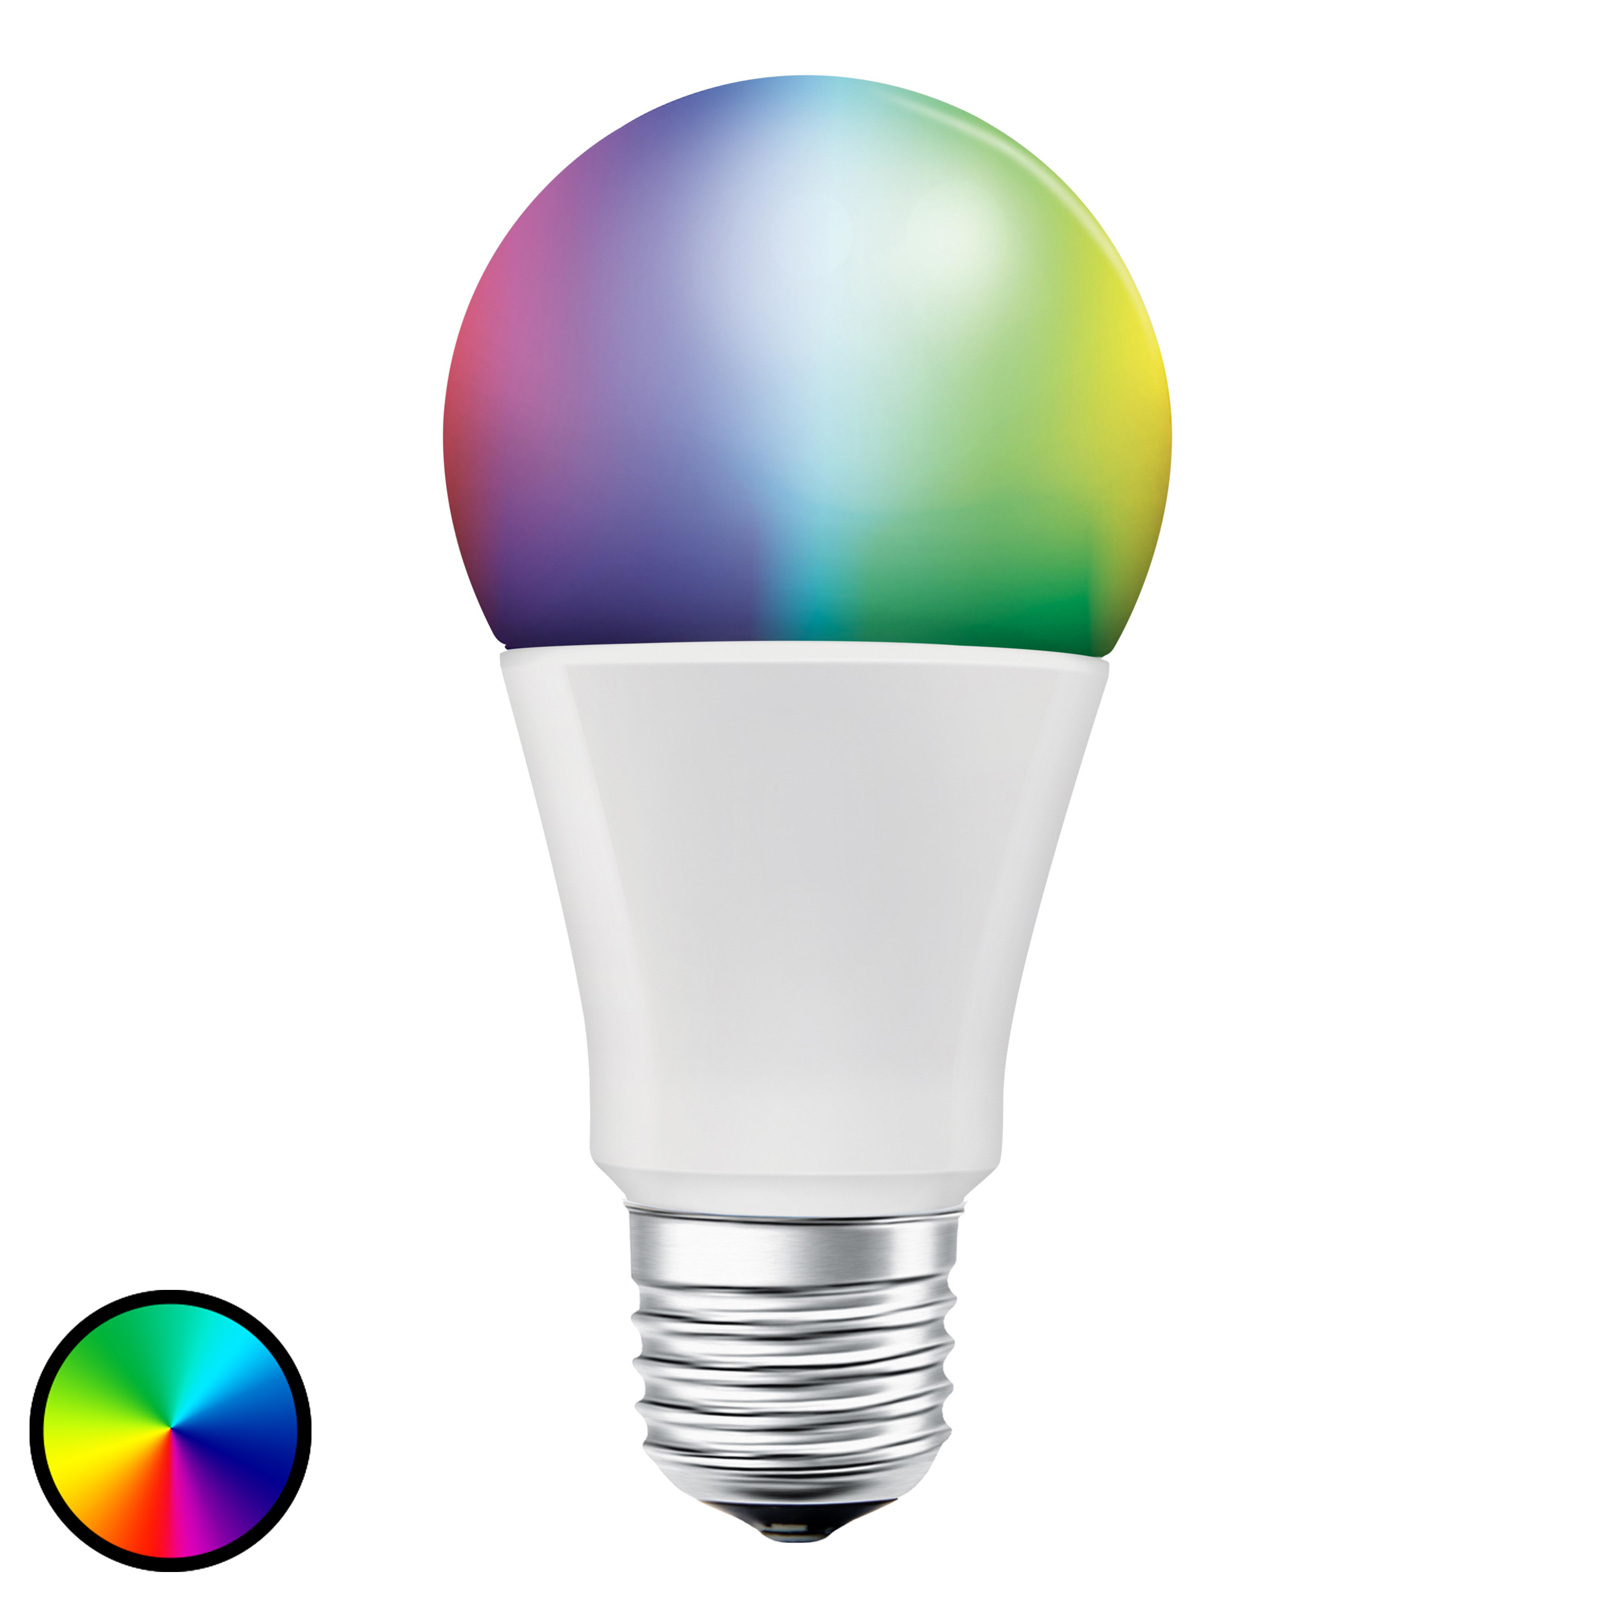 LEDVANCE SMART+ ZigBee E27 10W RGB 2,700-6,500K_6106205_1